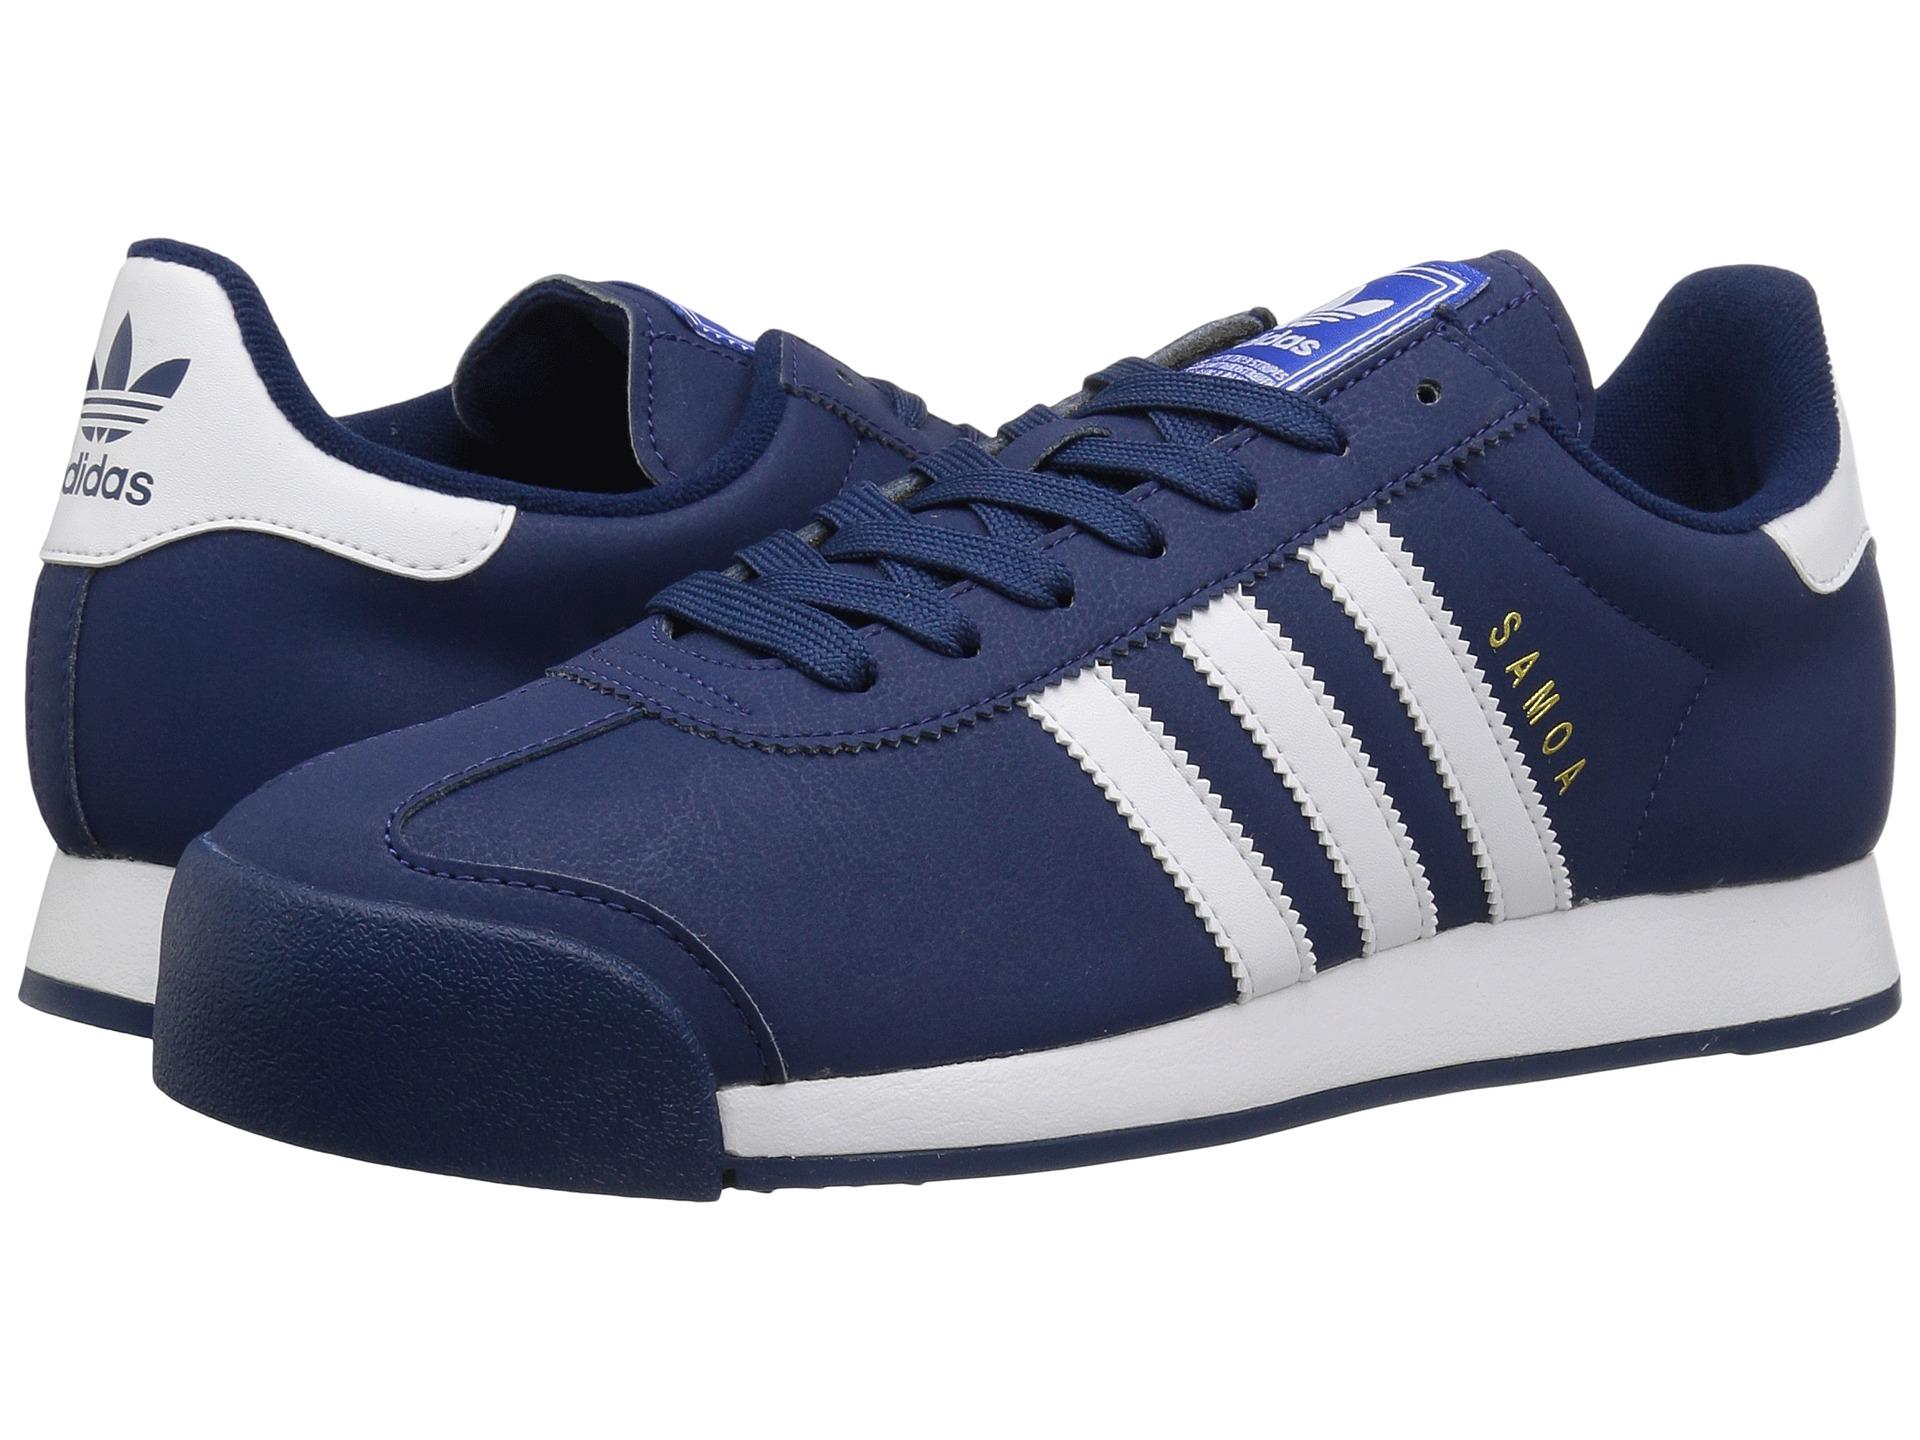 Adidas Samoa Shoes Zappos